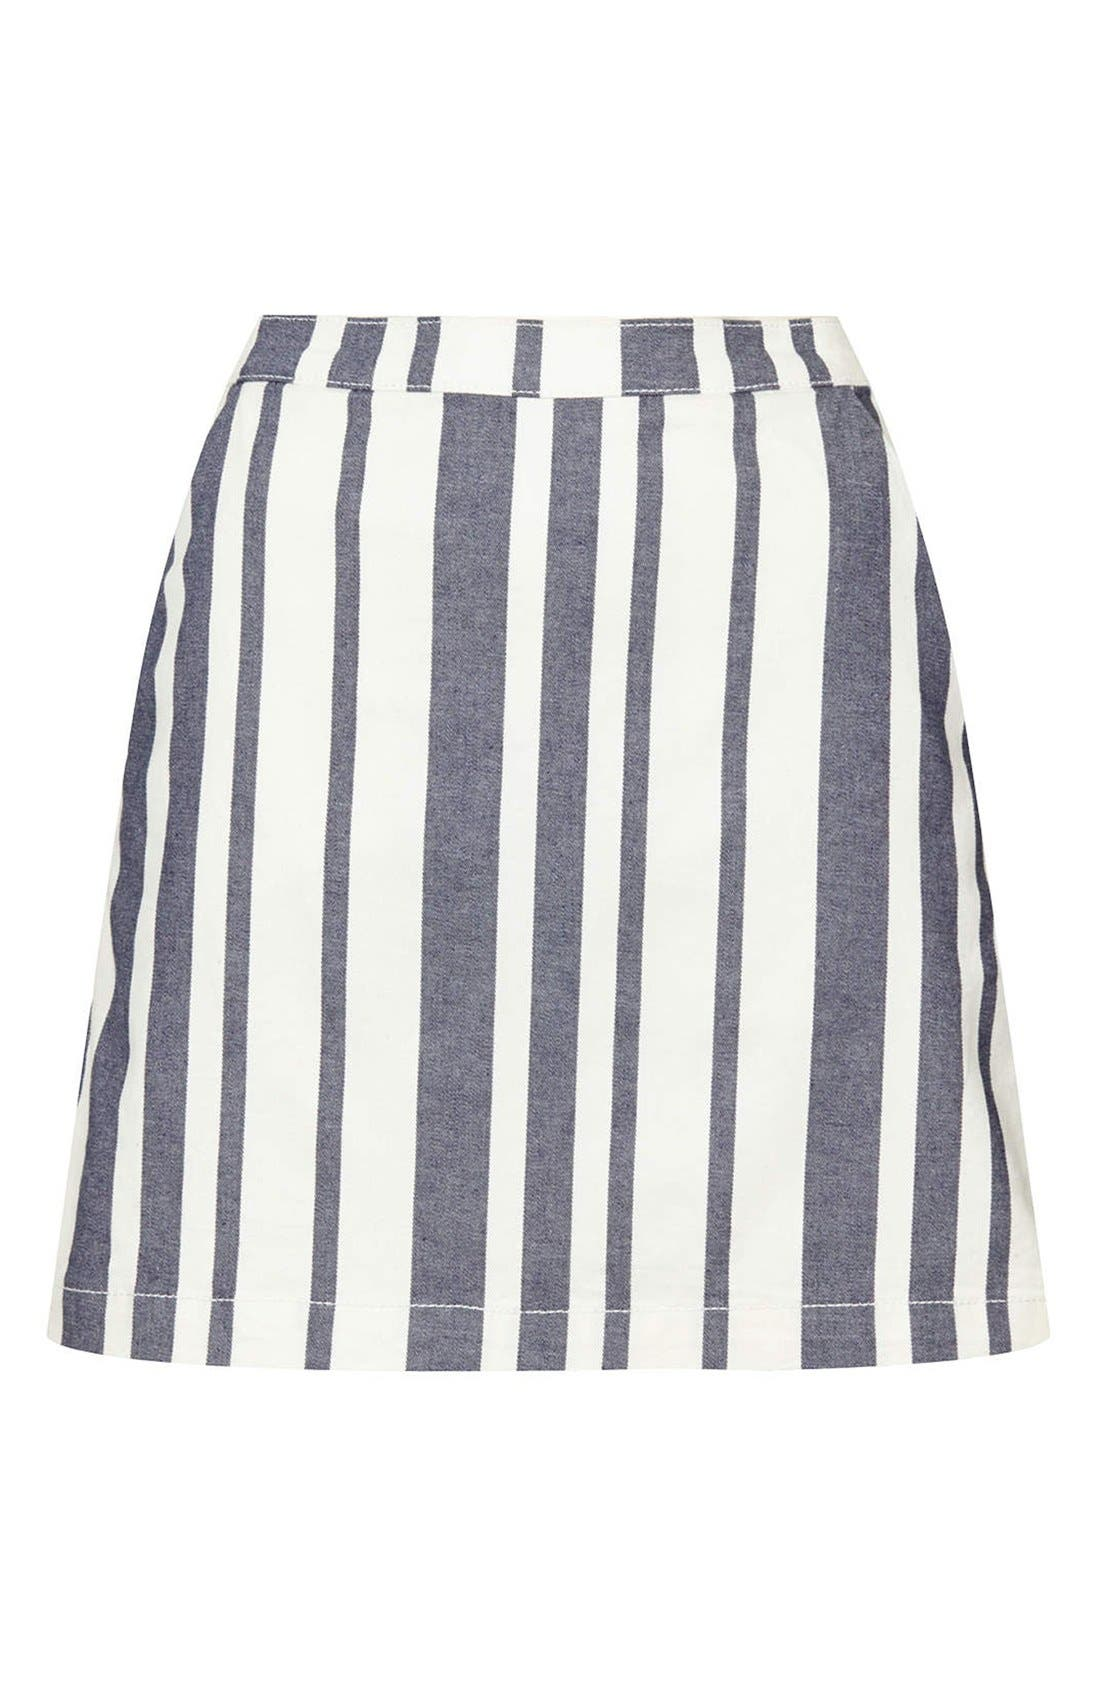 Alternate Image 3  - Topshop Moto Stripe Denim Skirt